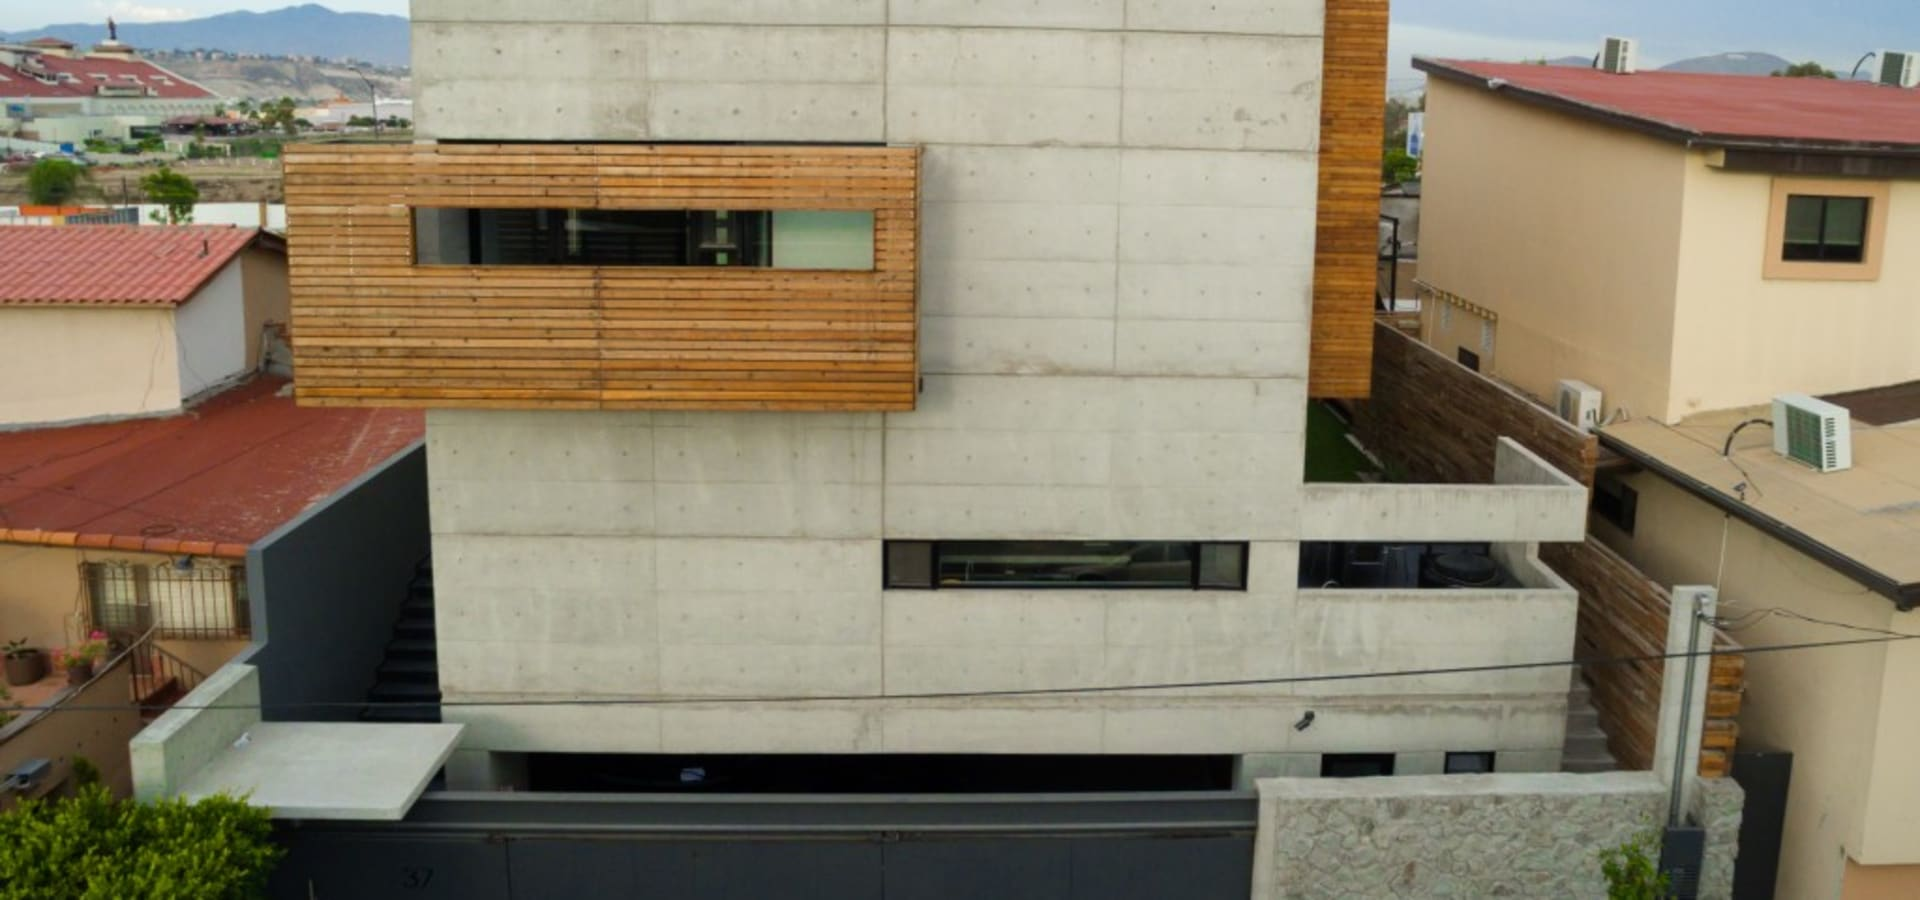 Guillot Arquitectos